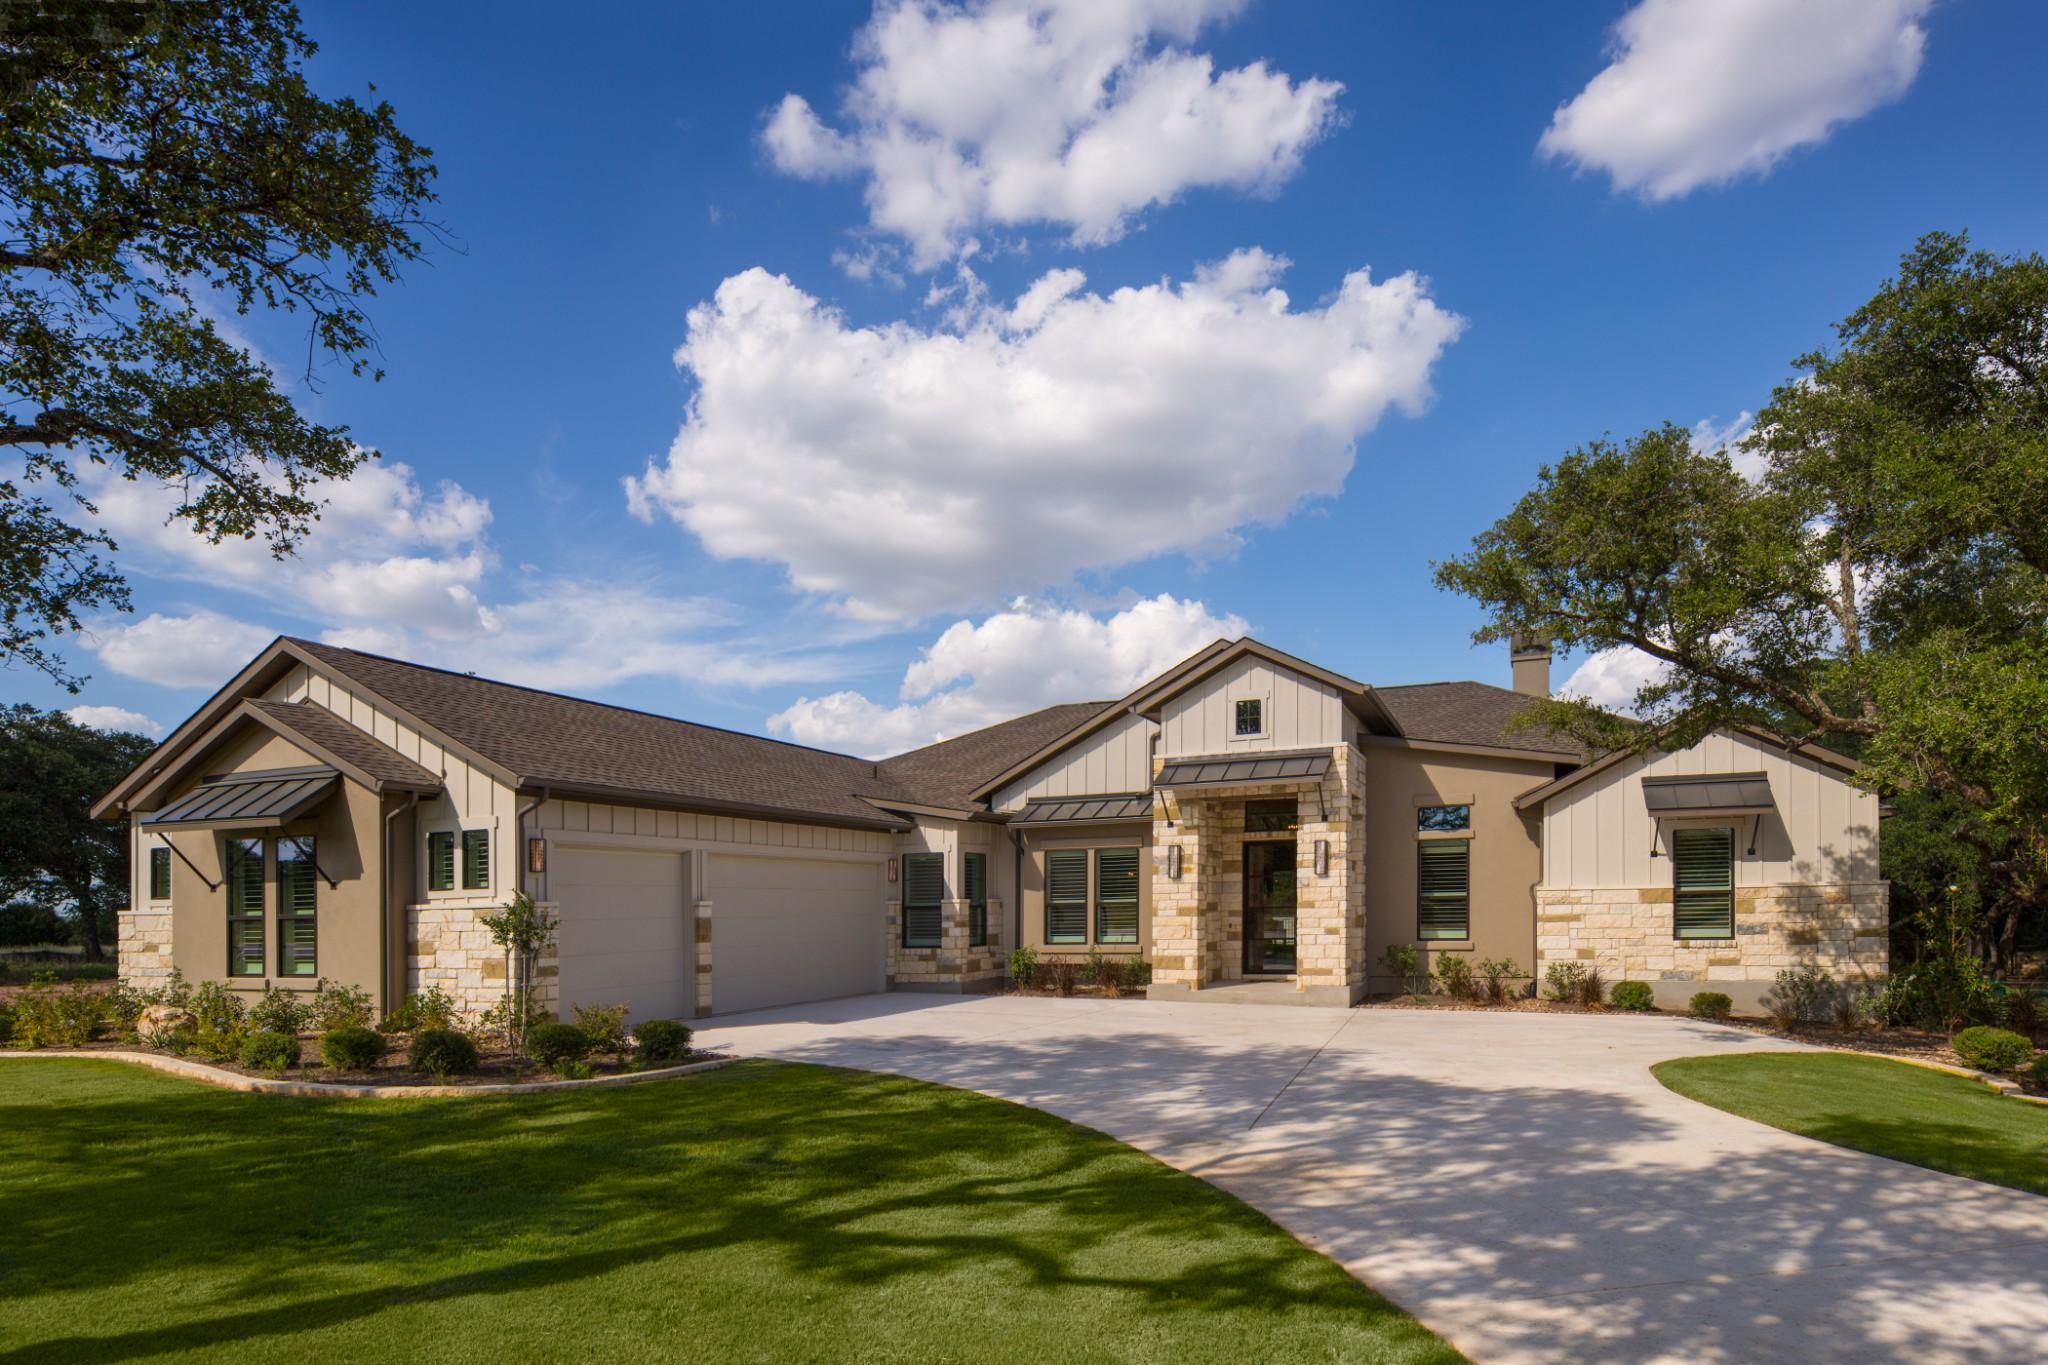 6015 Lookaway Cir, Franklin, TN 37067 - Franklin, TN real estate listing